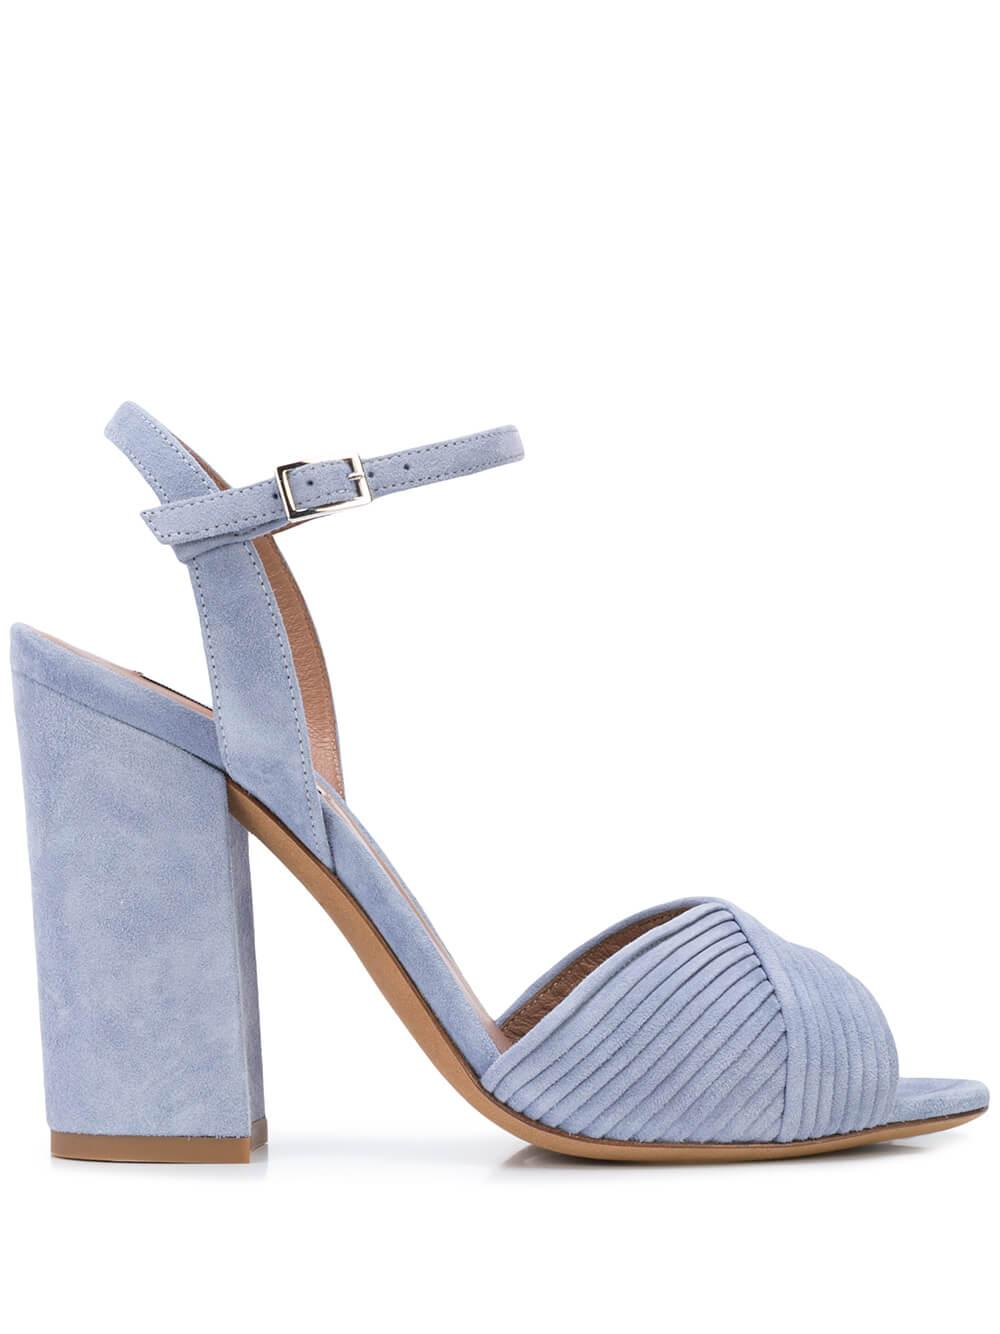 Kali Suede Block Heel Sandal